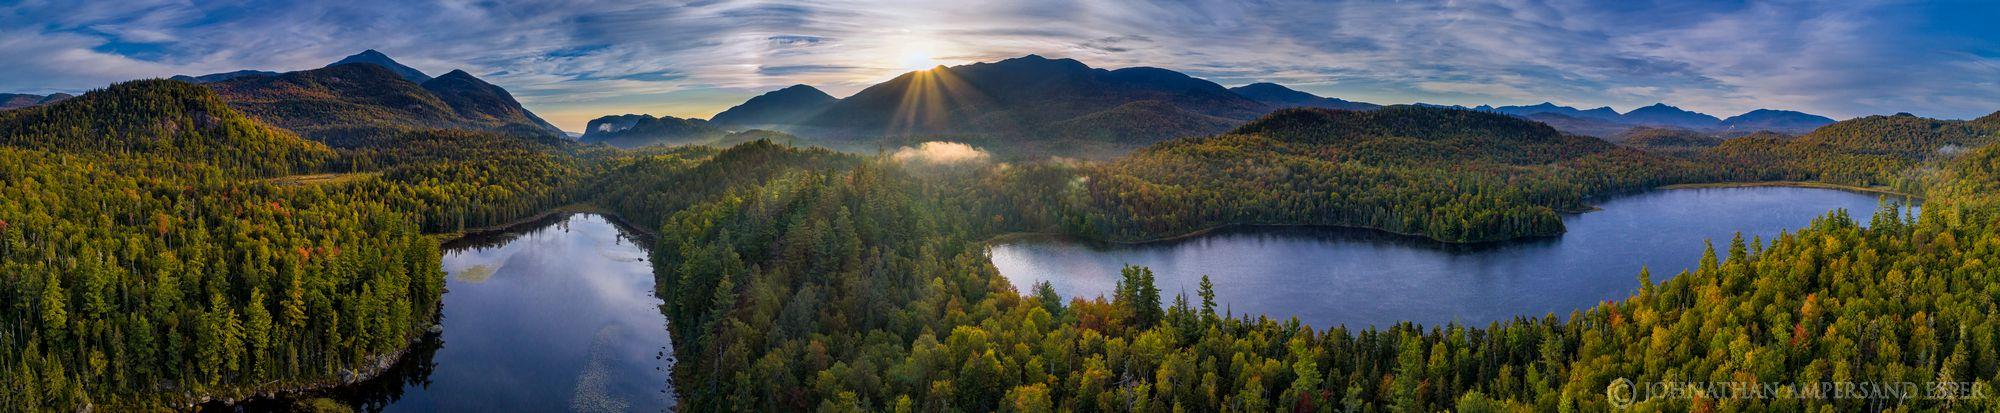 Connery Pond,Long Pond,Whiteface Mt,Whiteface,Whiteface Mountain,Wilmington Notch,Sentinel Range,Adirondacks,Adirondack High...